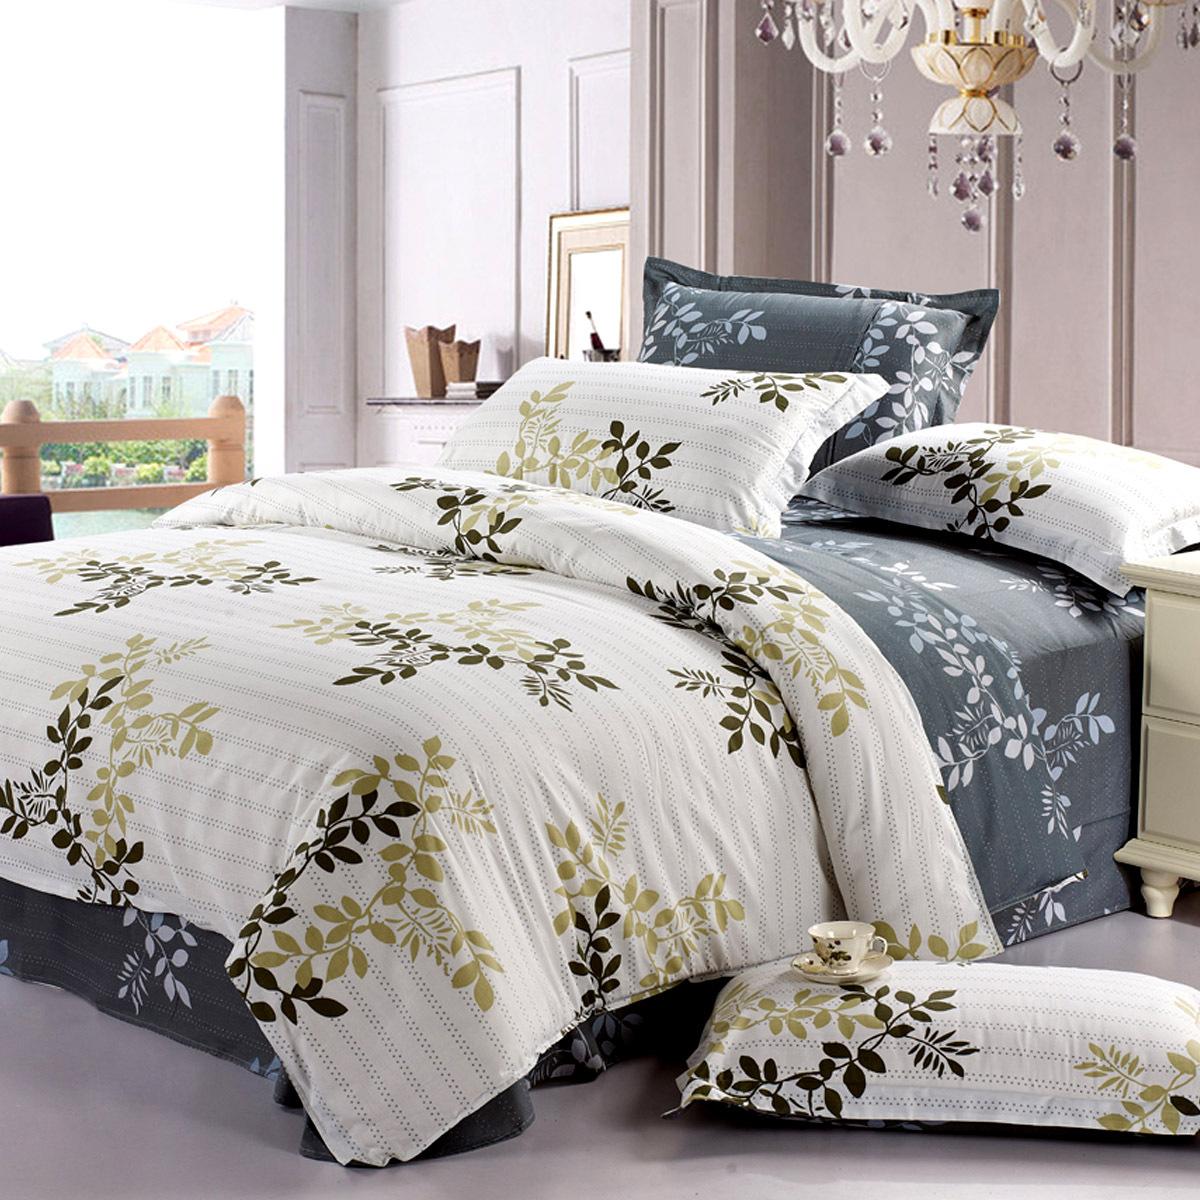 luxury hotel bedding set, Bond b06141 ,cotton bed sheets freeshipping(China (Mainland))